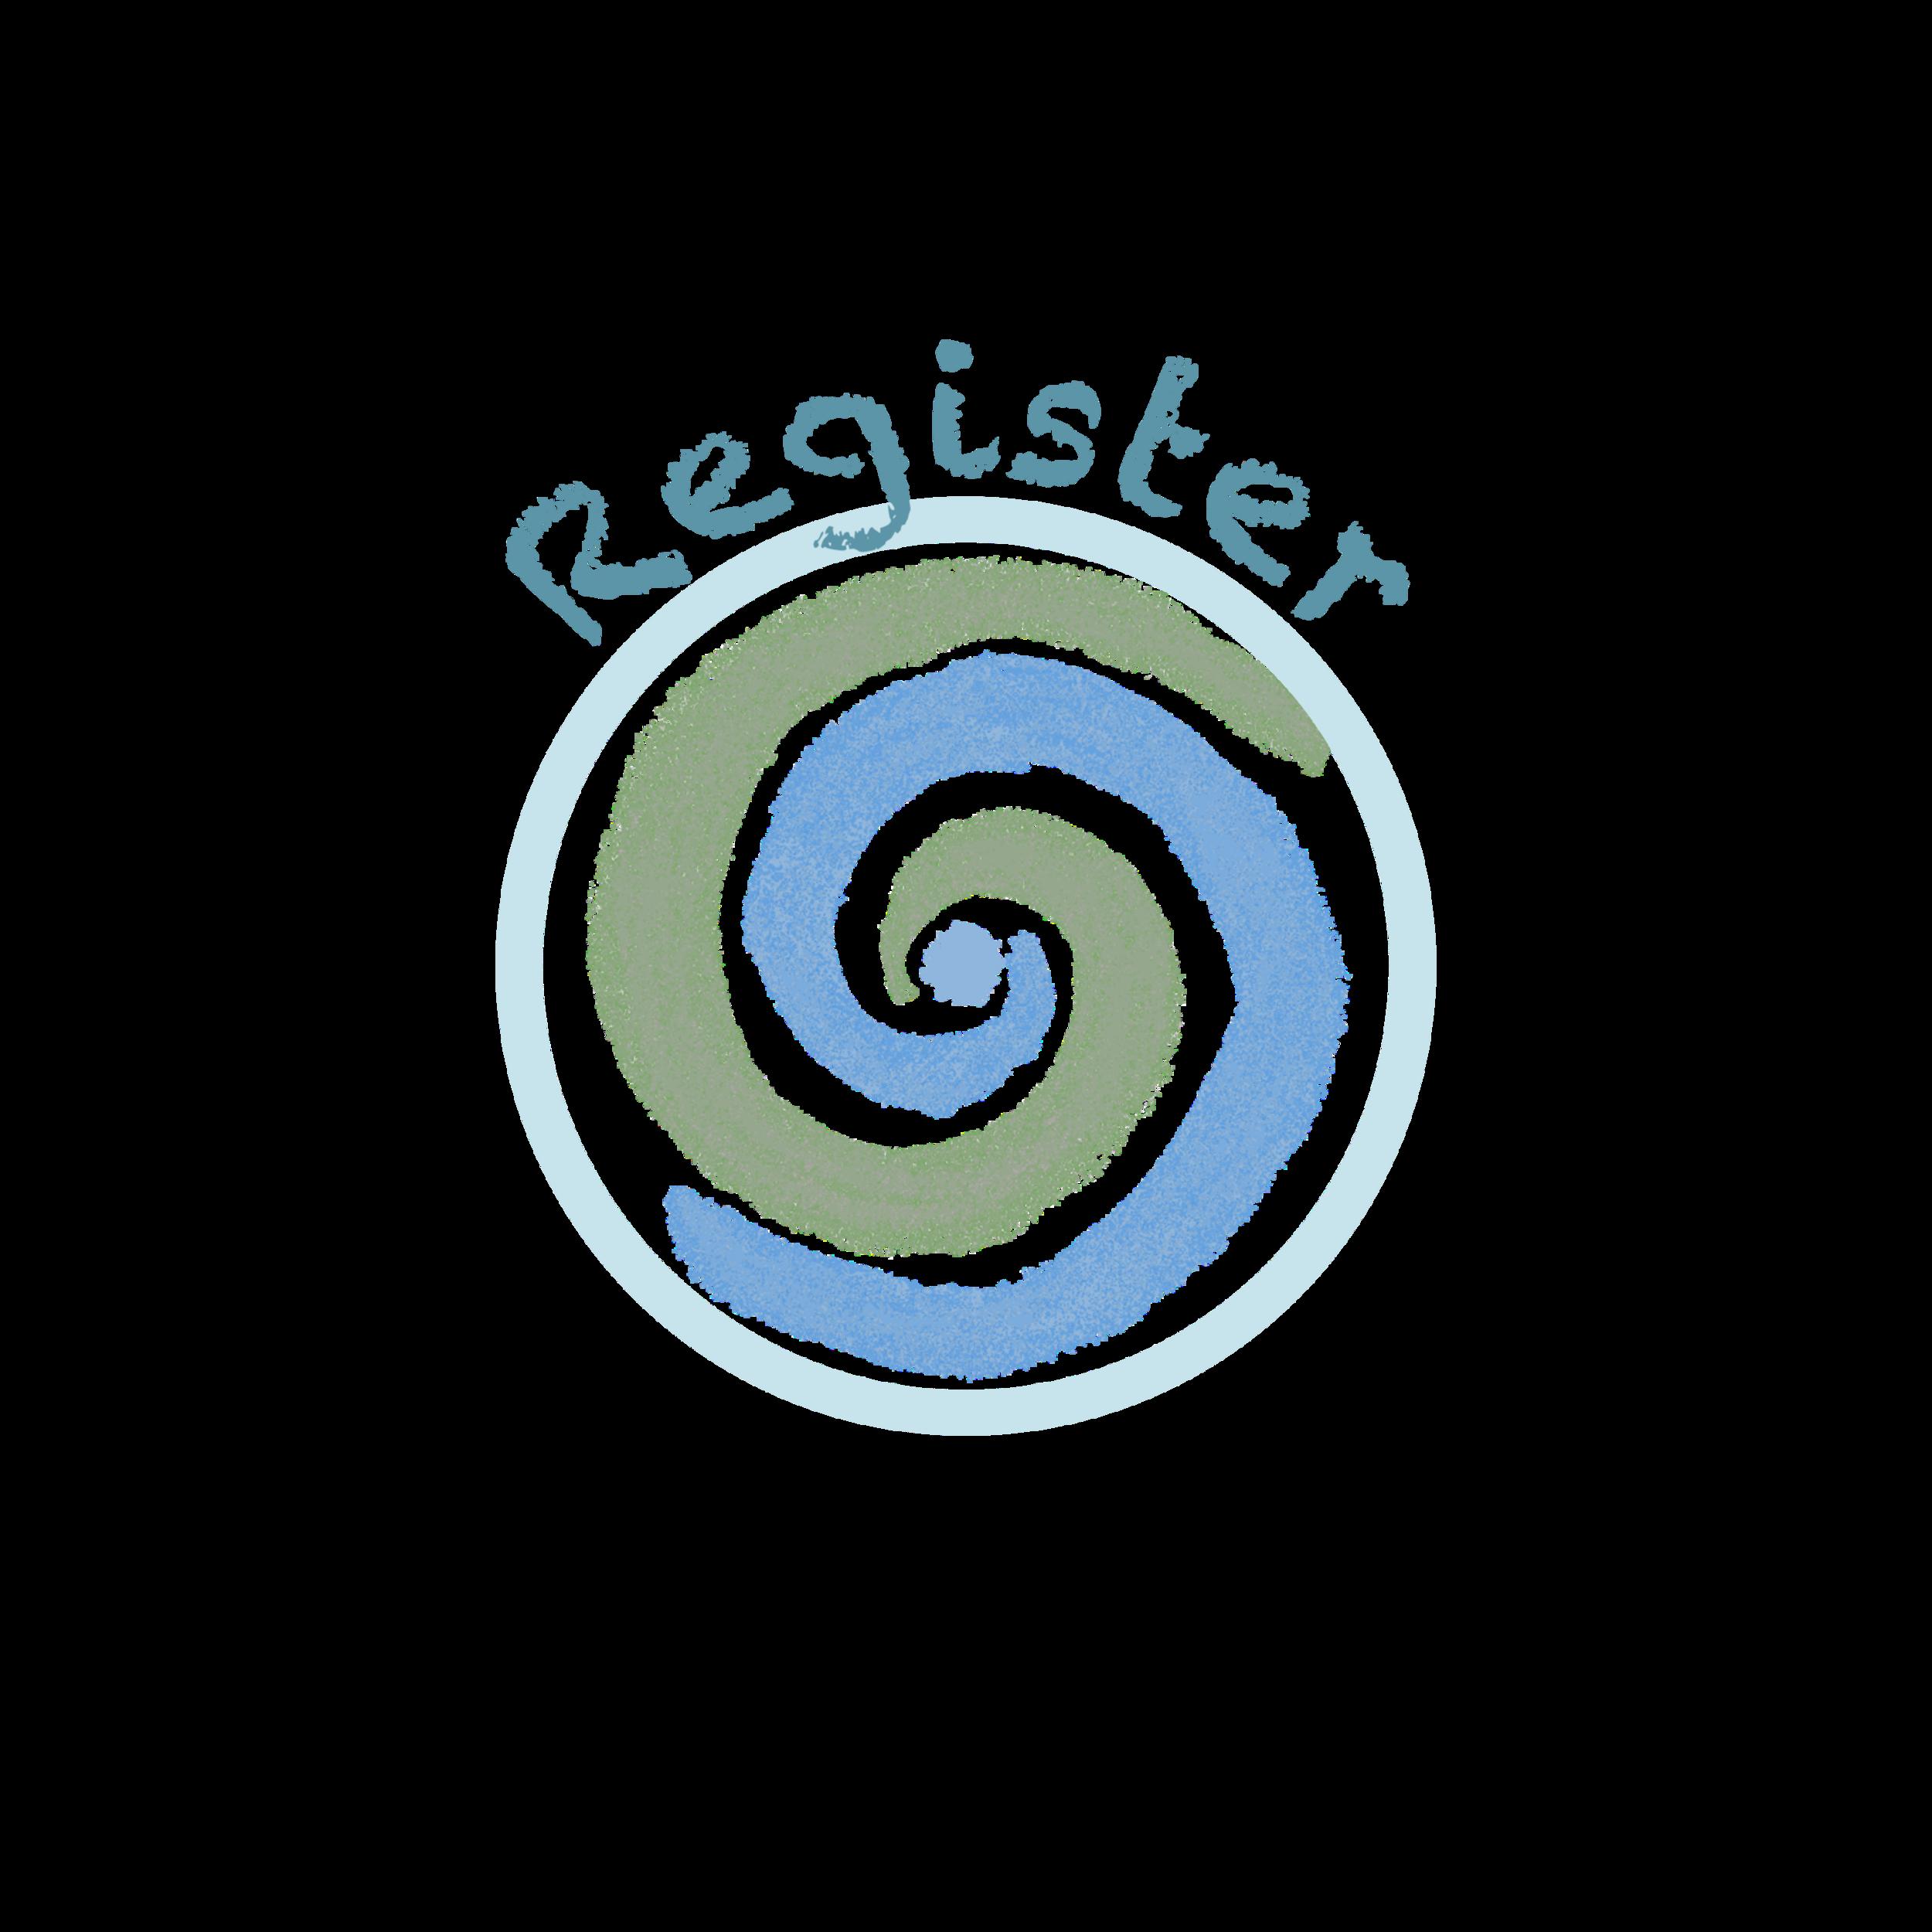 RCM register logo button.png